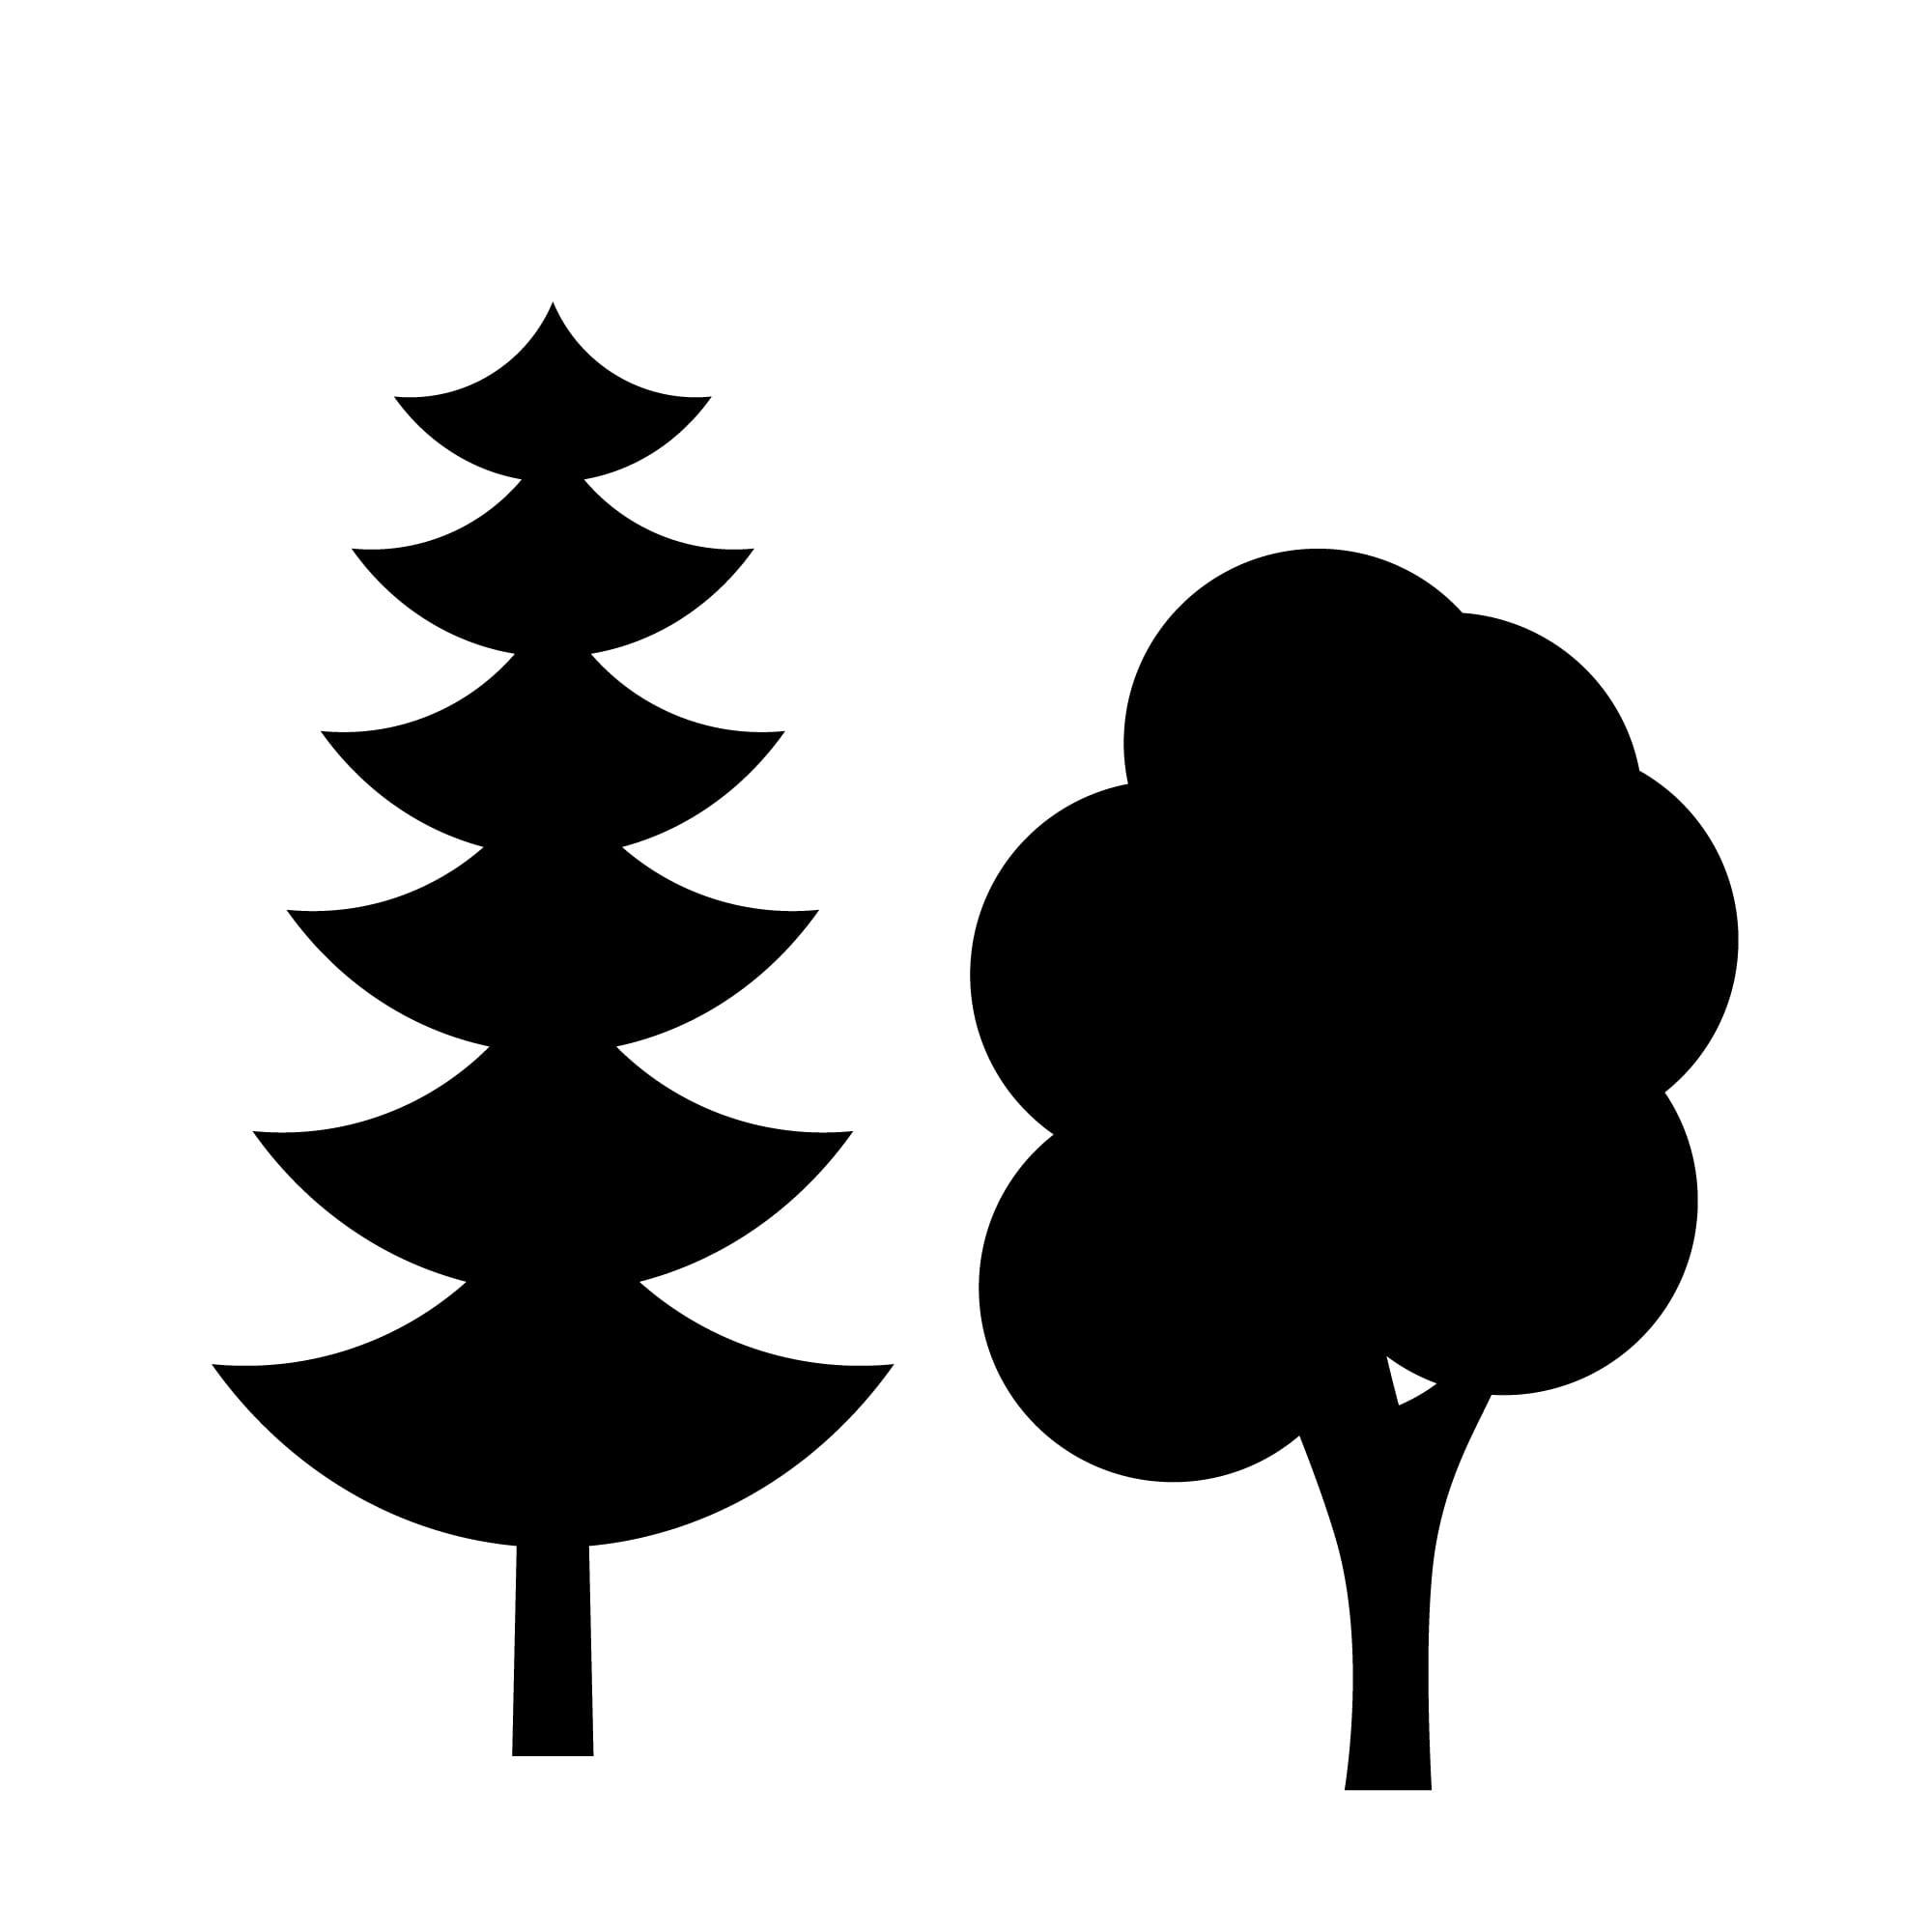 trees biomass